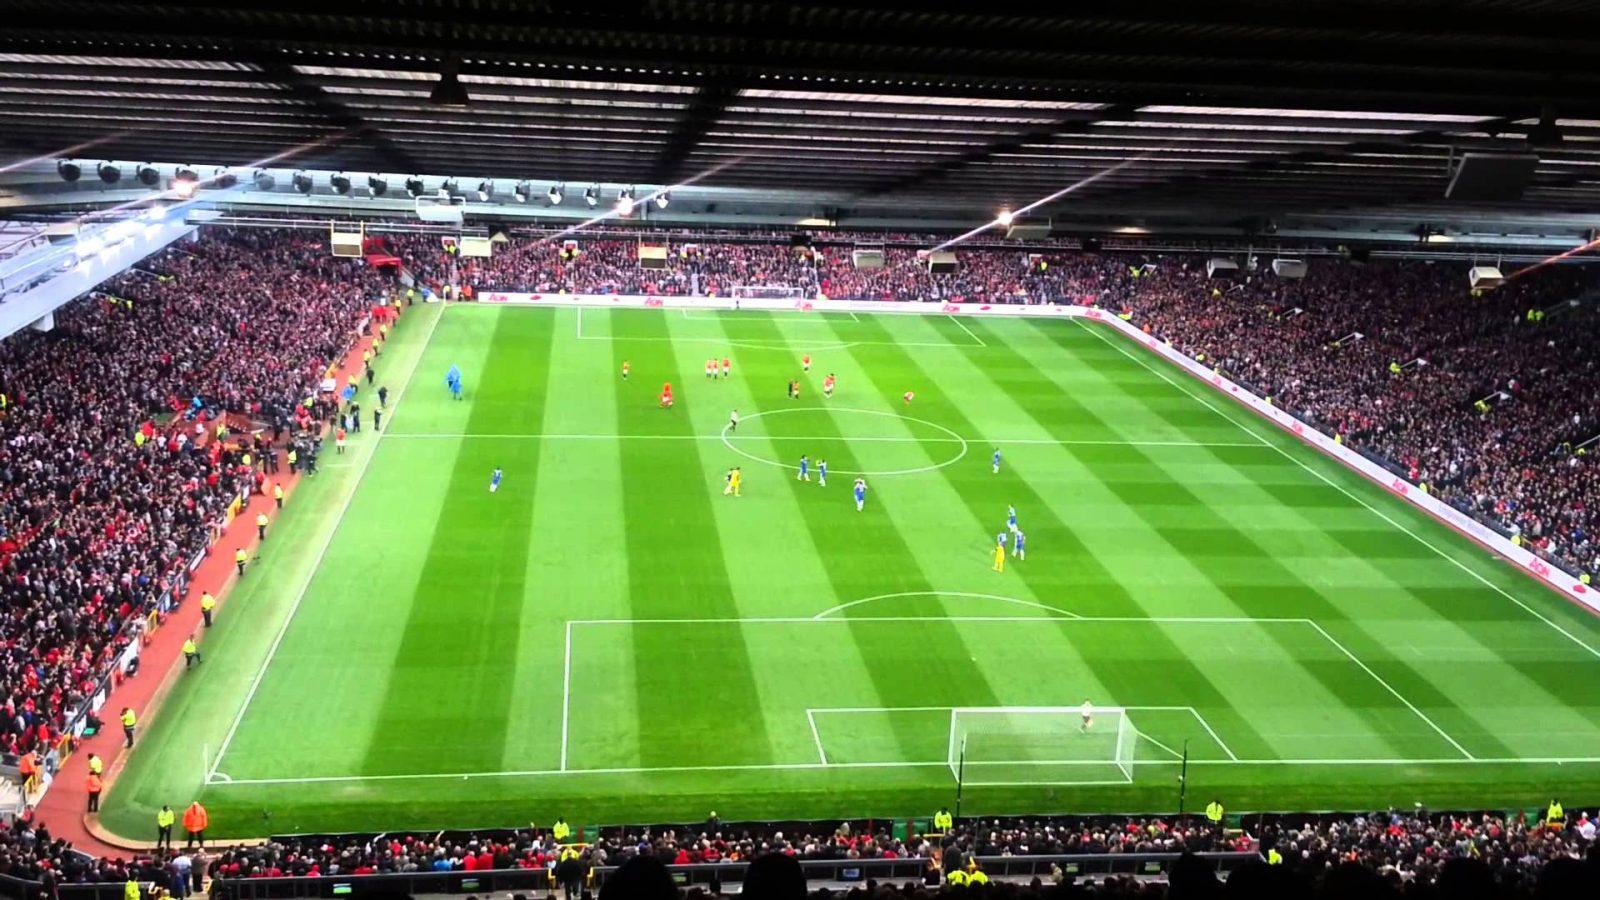 Porażka Chelsea po wyrównanym meczu na Old Trafford